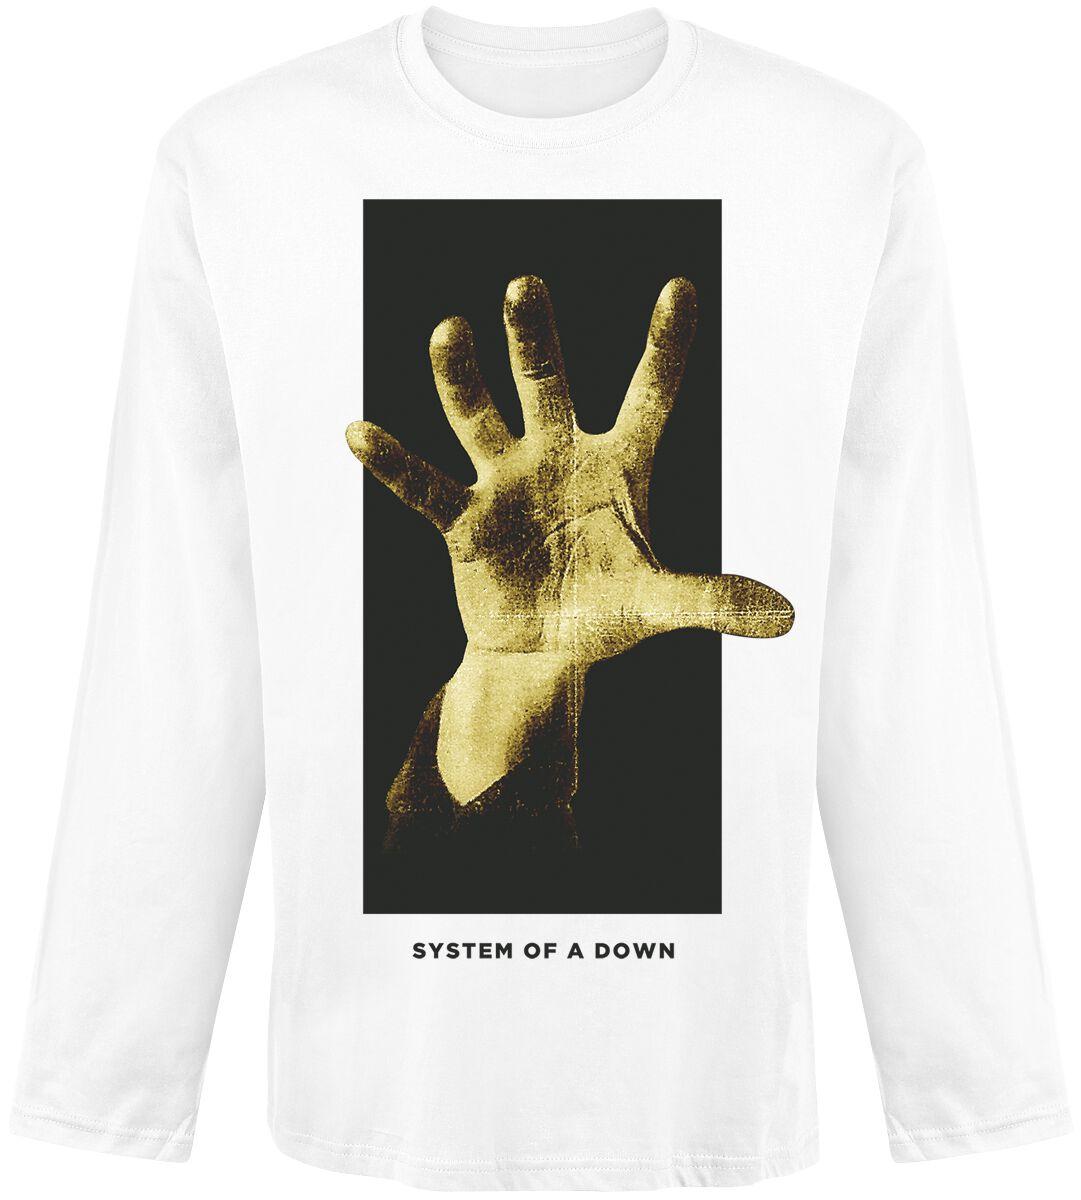 grabbing hand system of a down long sleeve shirt emp